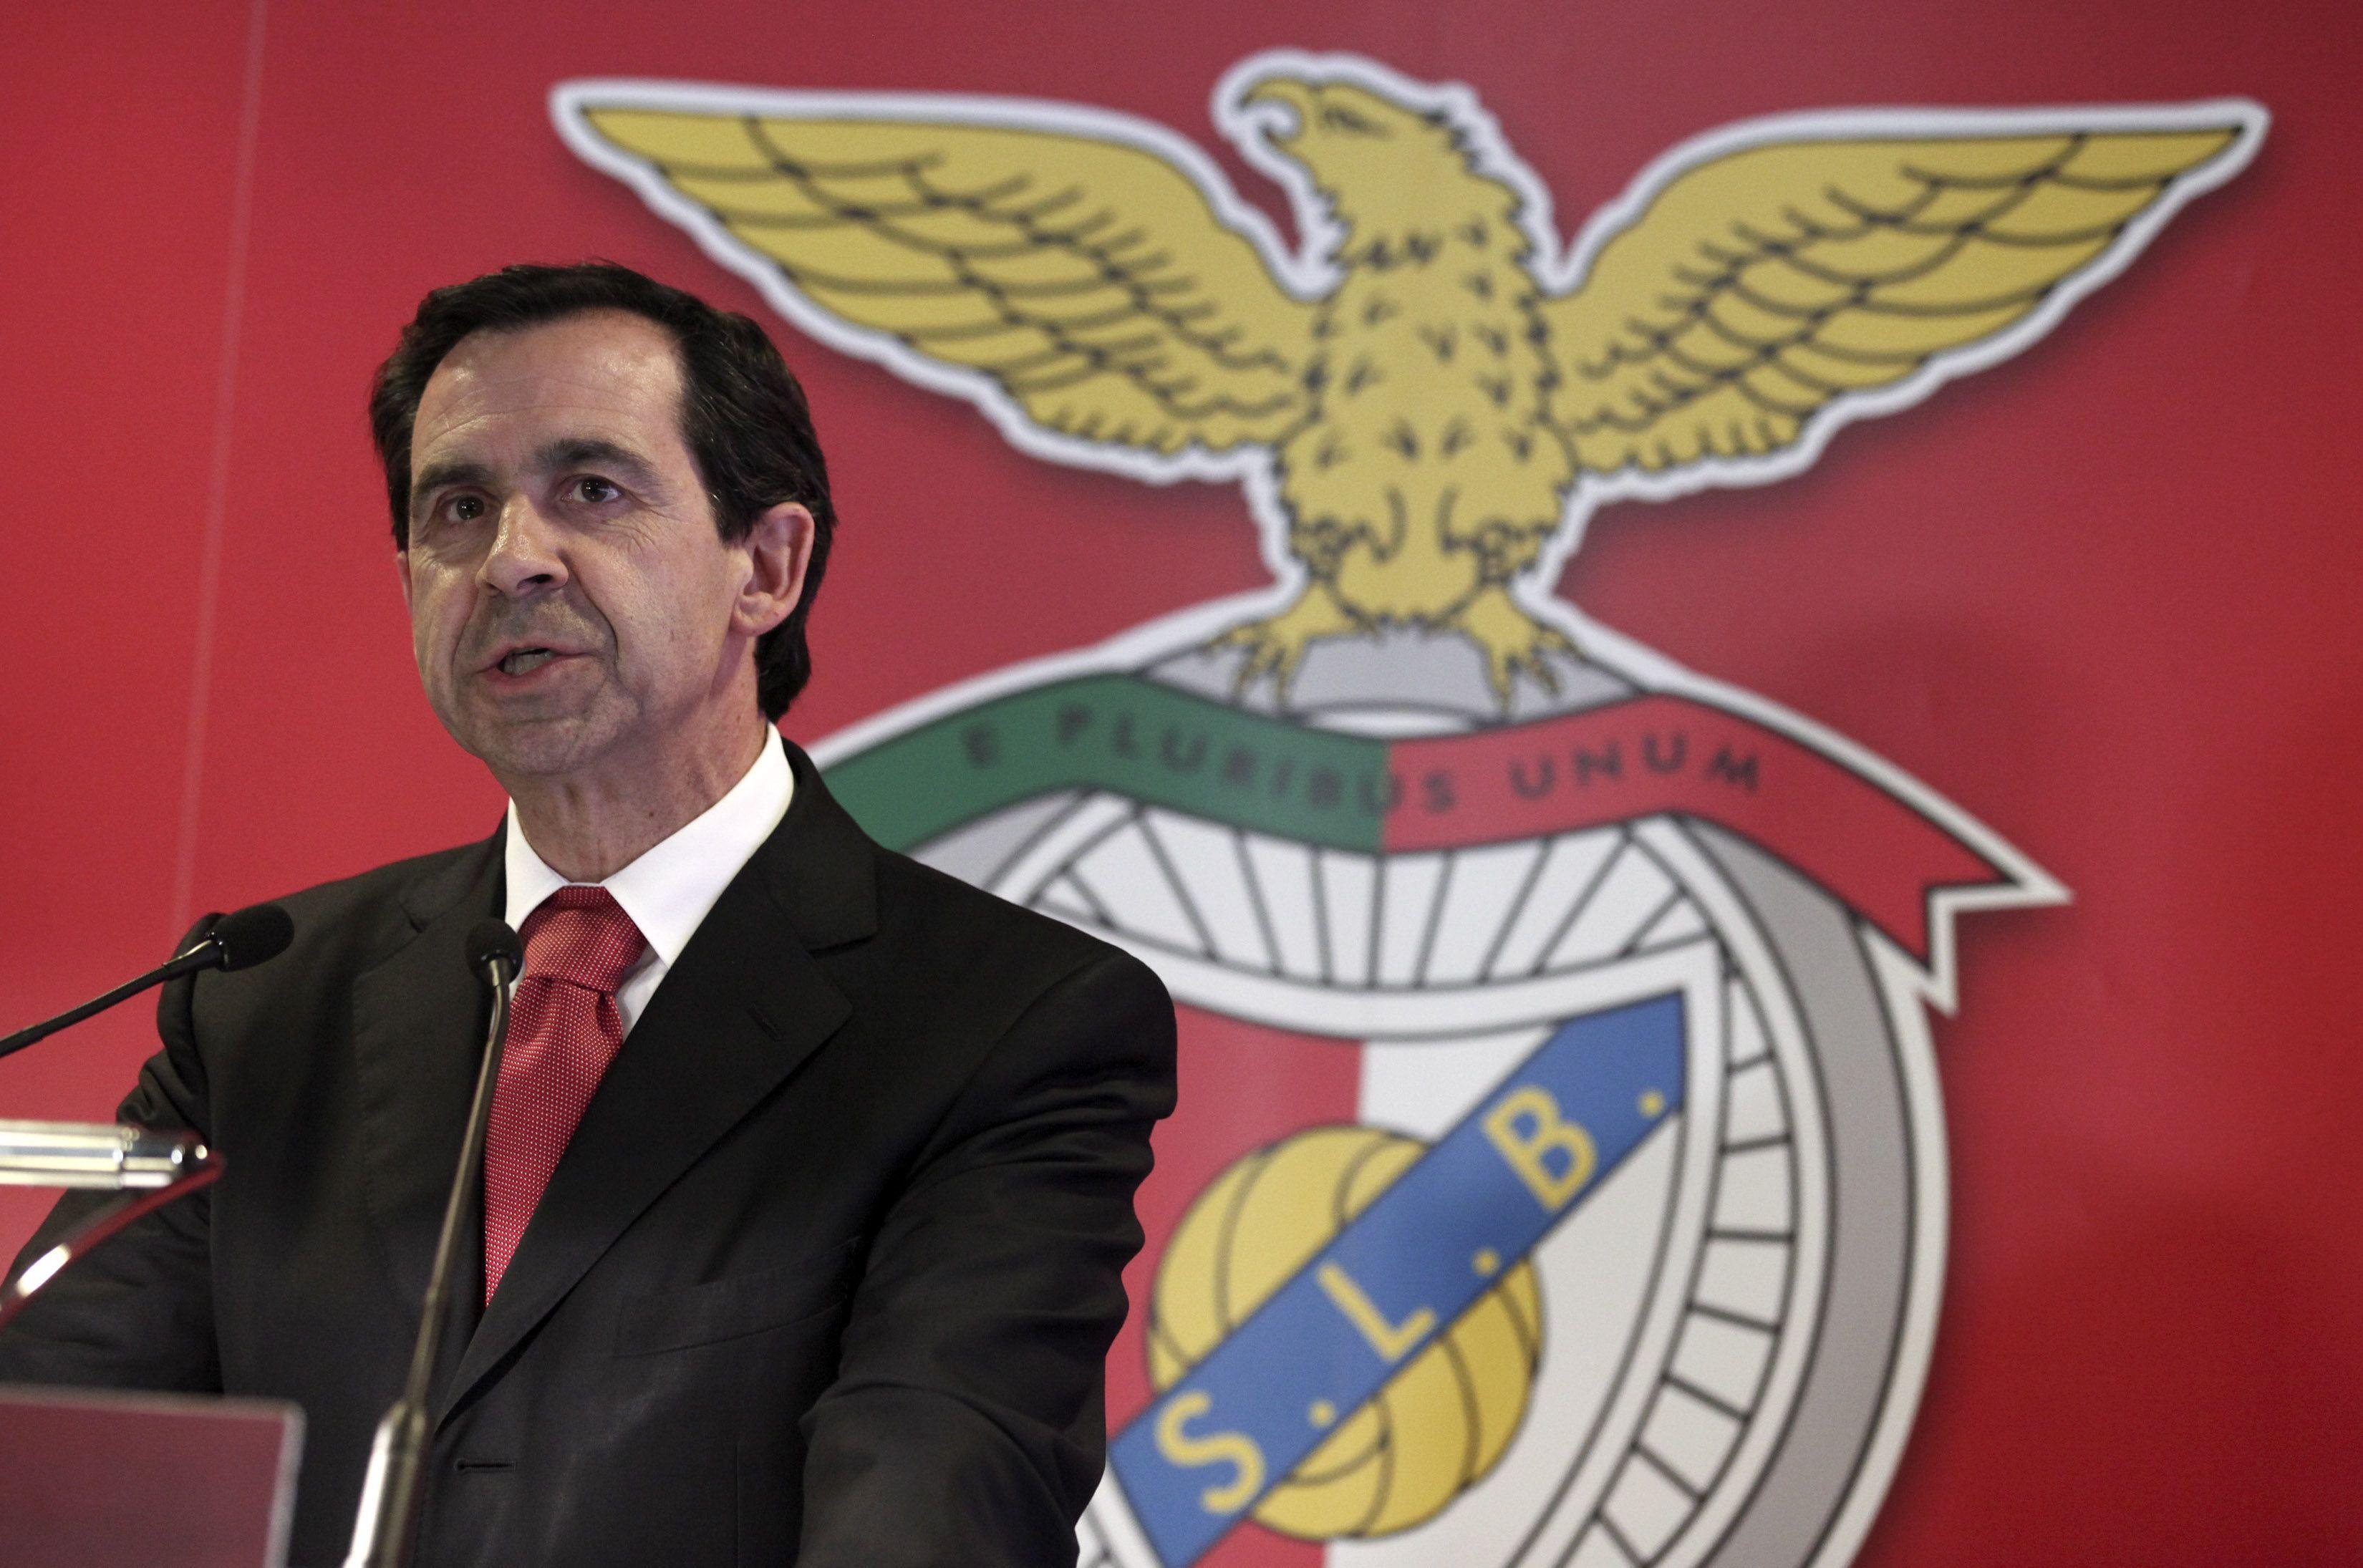 Sporting leva a tribunal factos apresentados por Rui Gomes da Silva, do Benfica